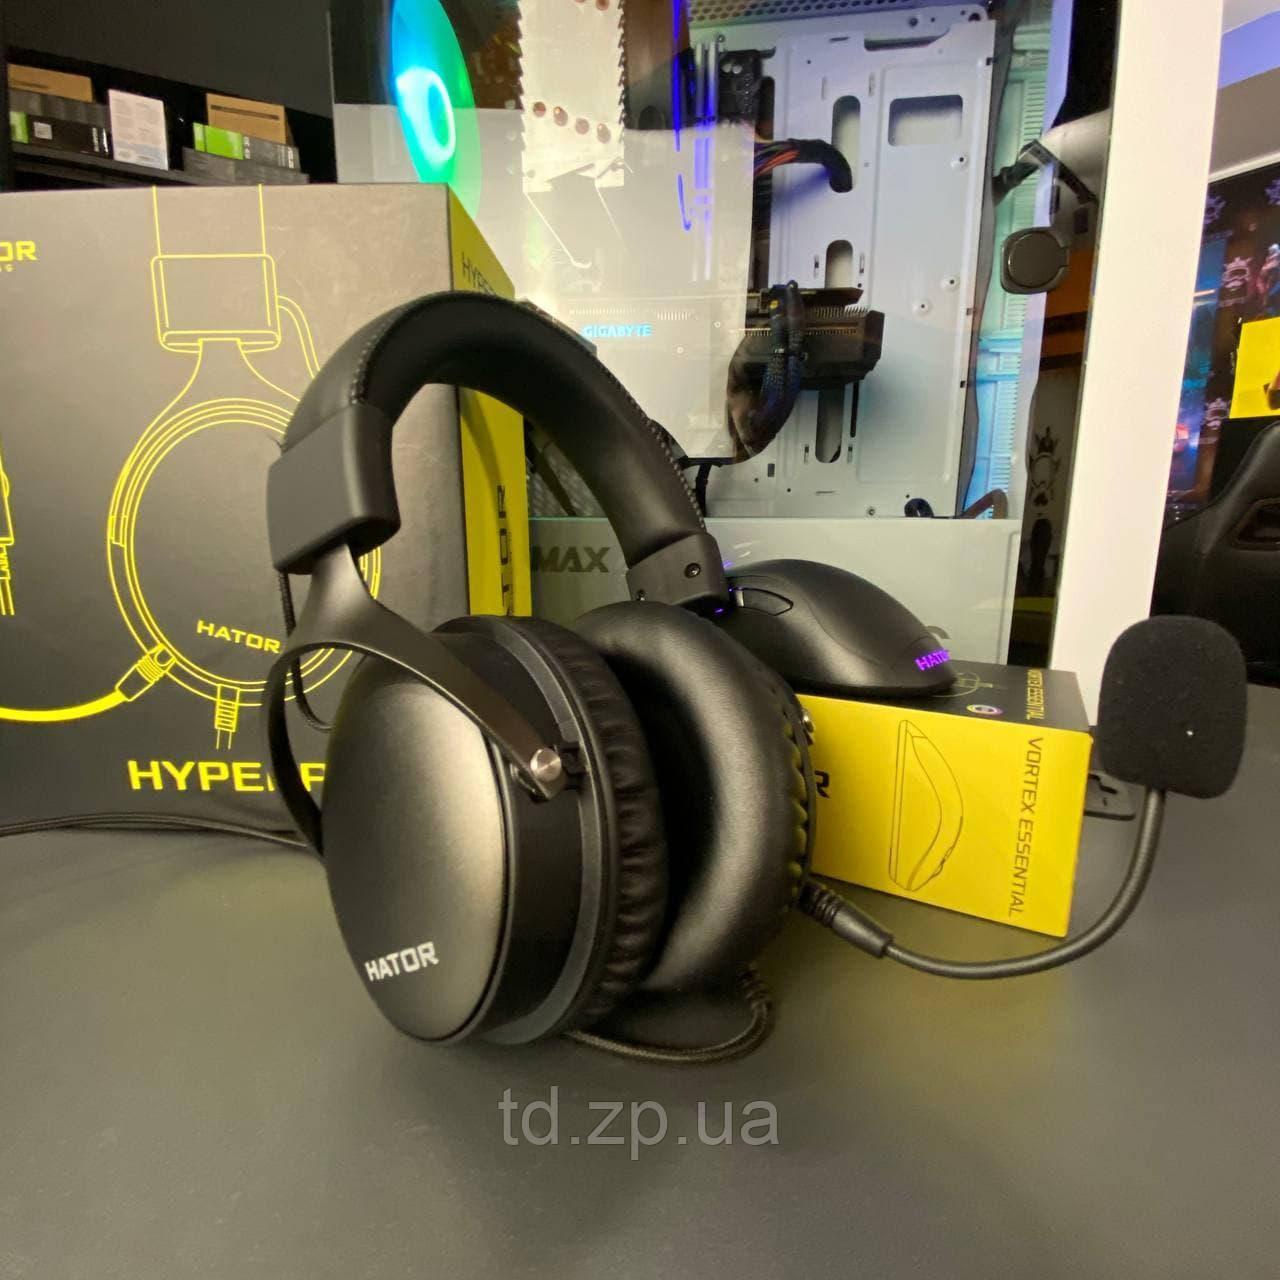 Навушники HATOR Hyperpunk